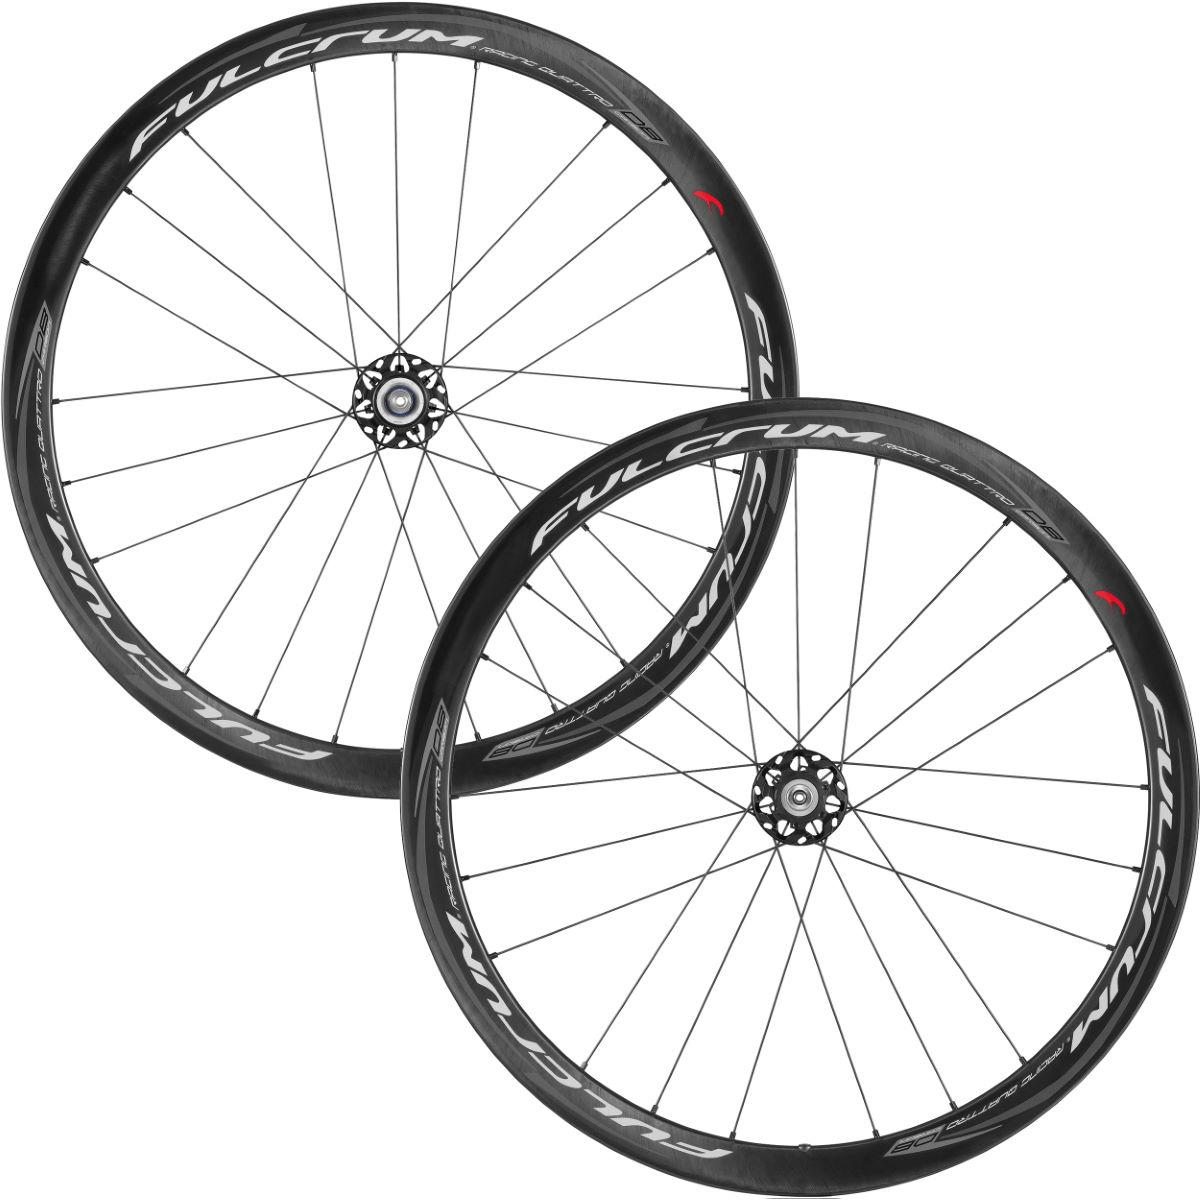 Fulcrum Racing Quattro Carbon Clincher Wheelset Disc Performance Wheels